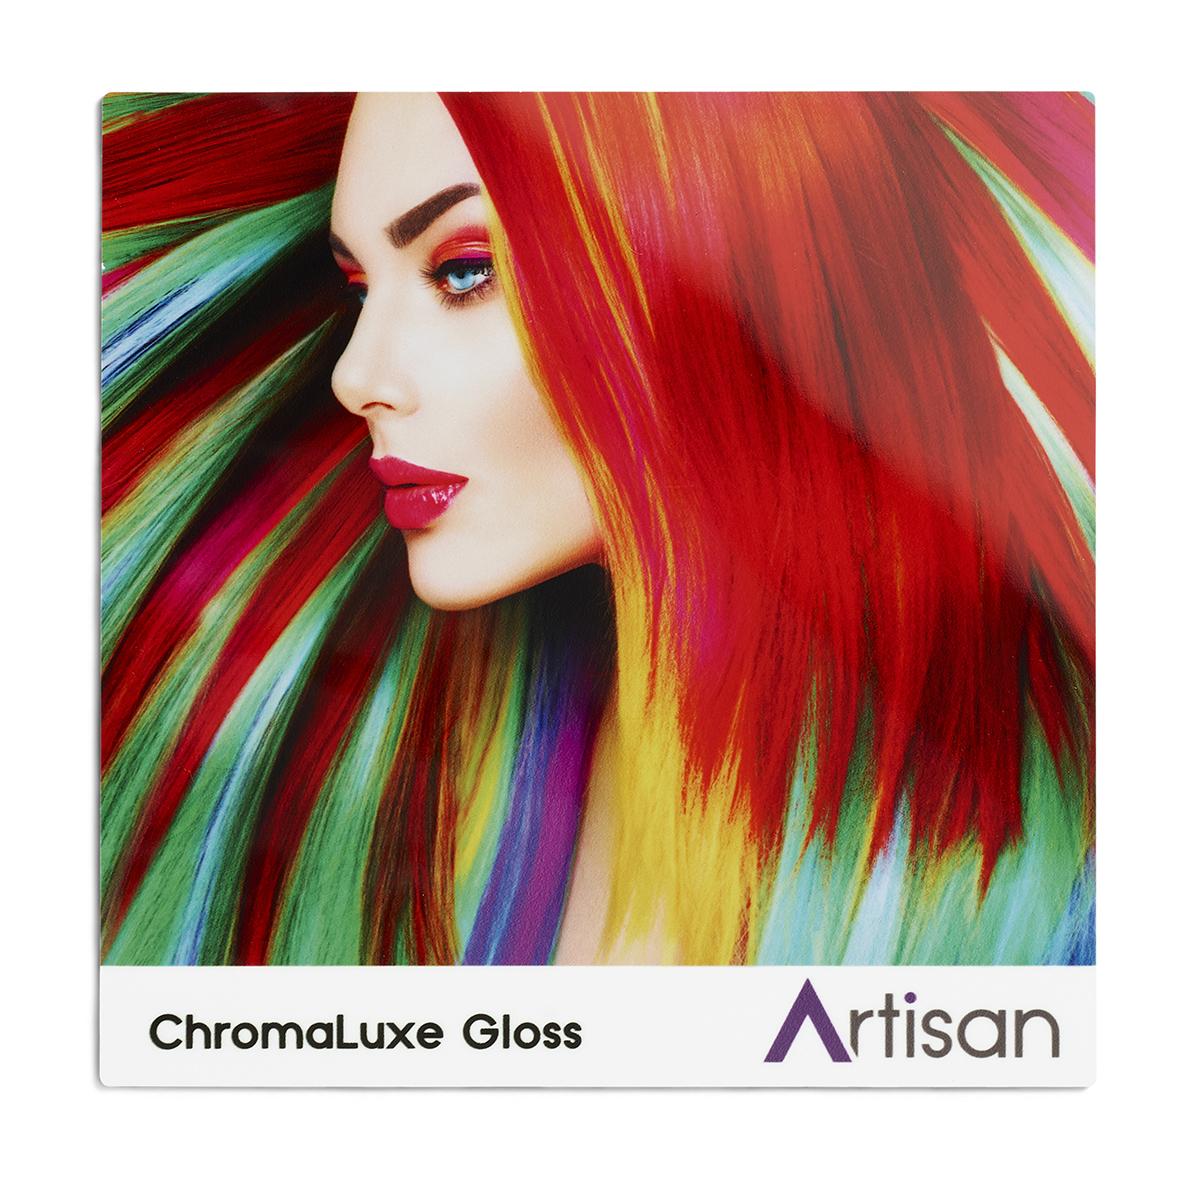 ChromaLuxe gloss overhead